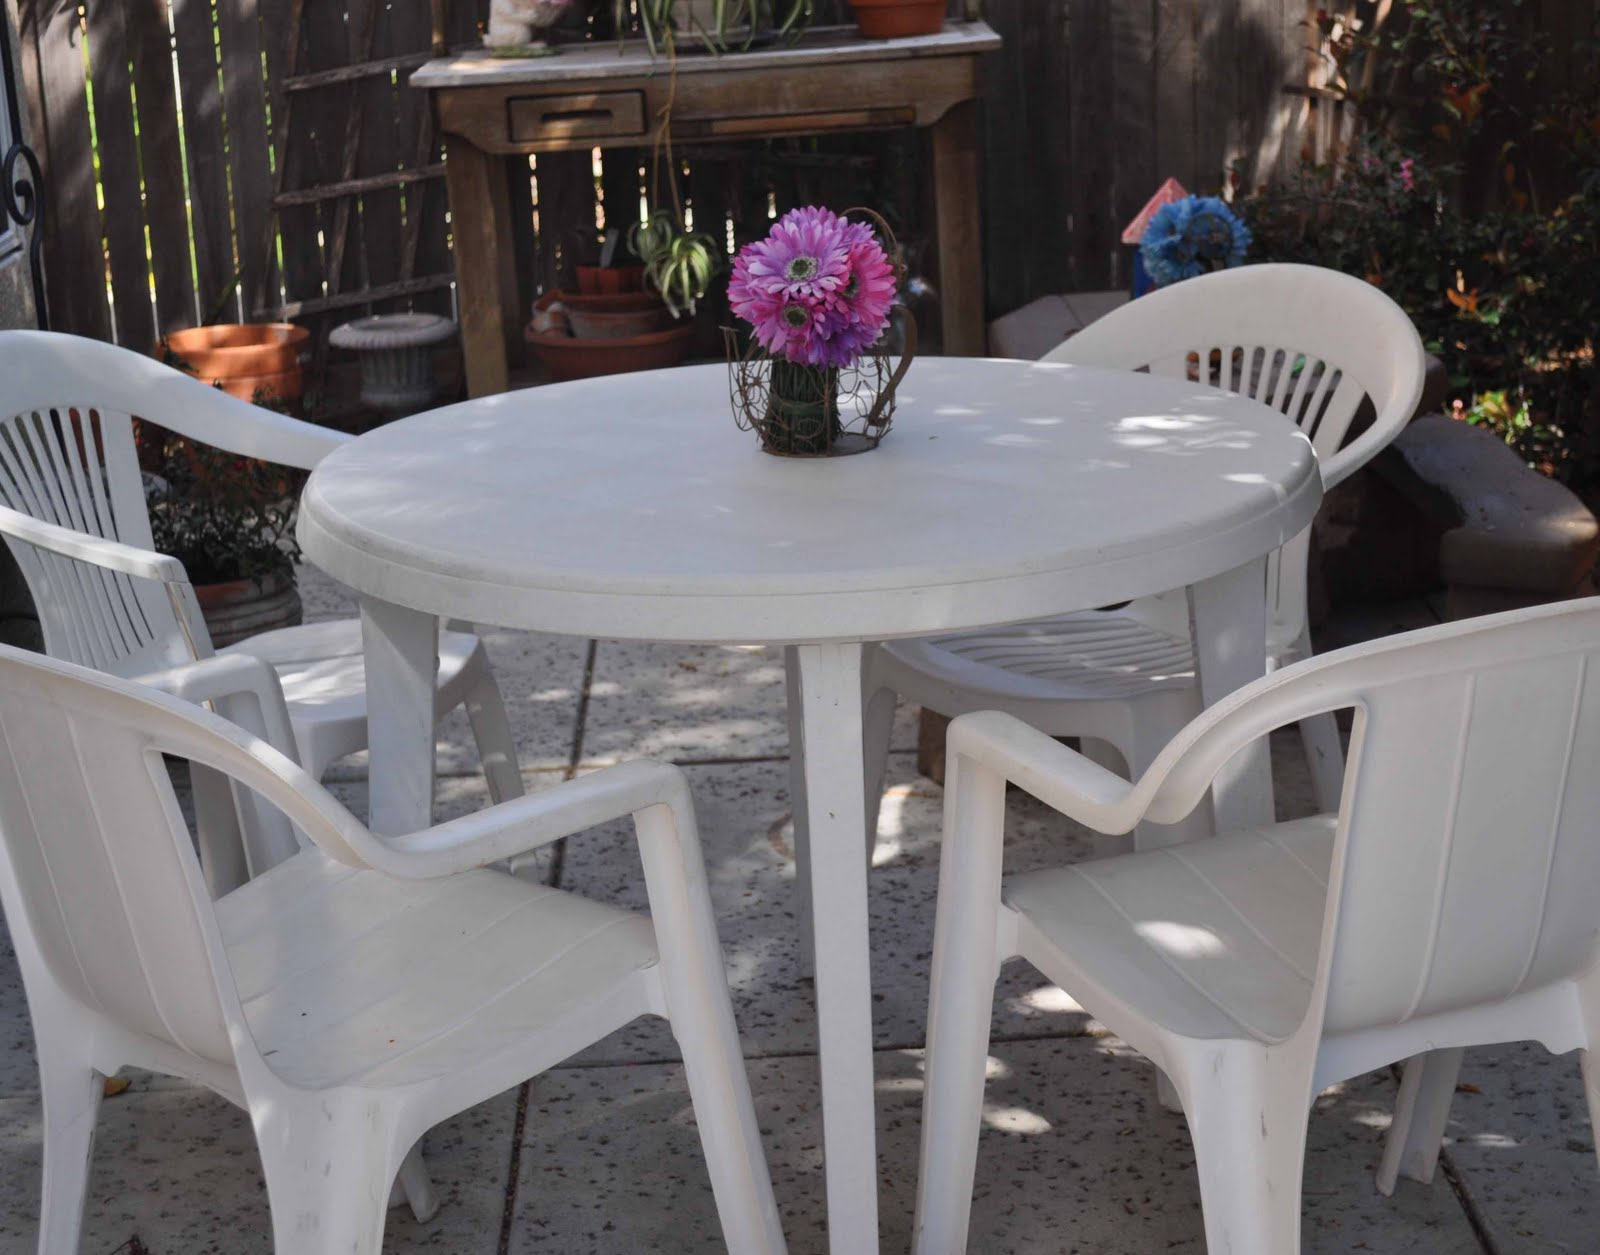 Resin Patio Furniture Makeover - Laura K. Bray Designs